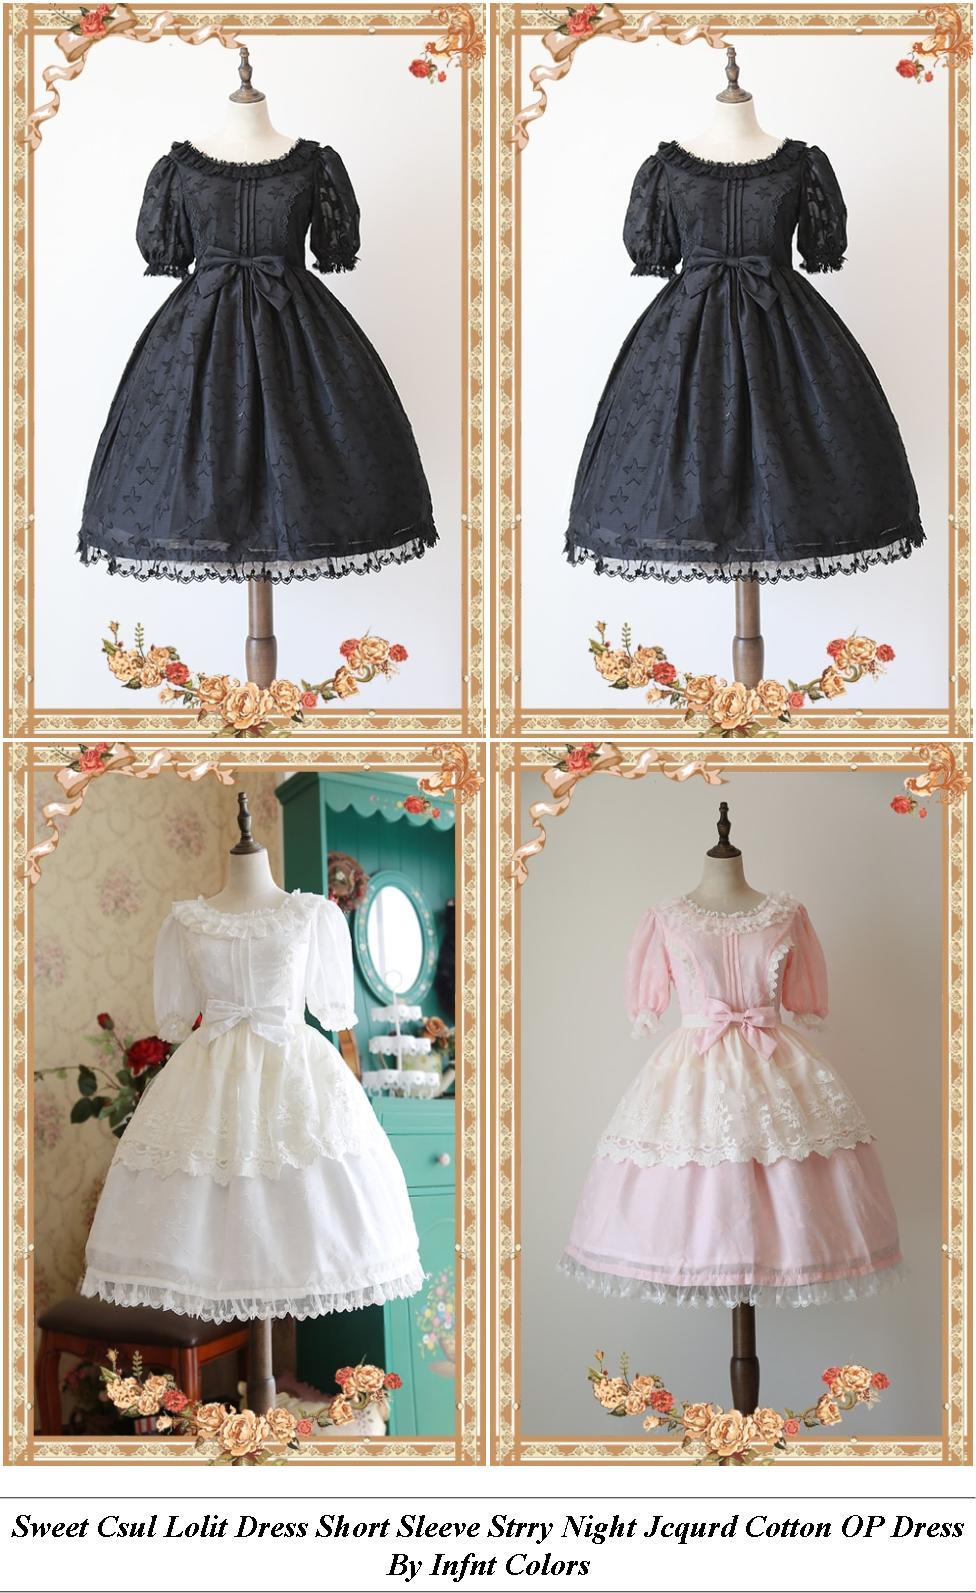 Black Dresses For Women - Us Sale - Sweater Dress - Cheap Fashion Clothes